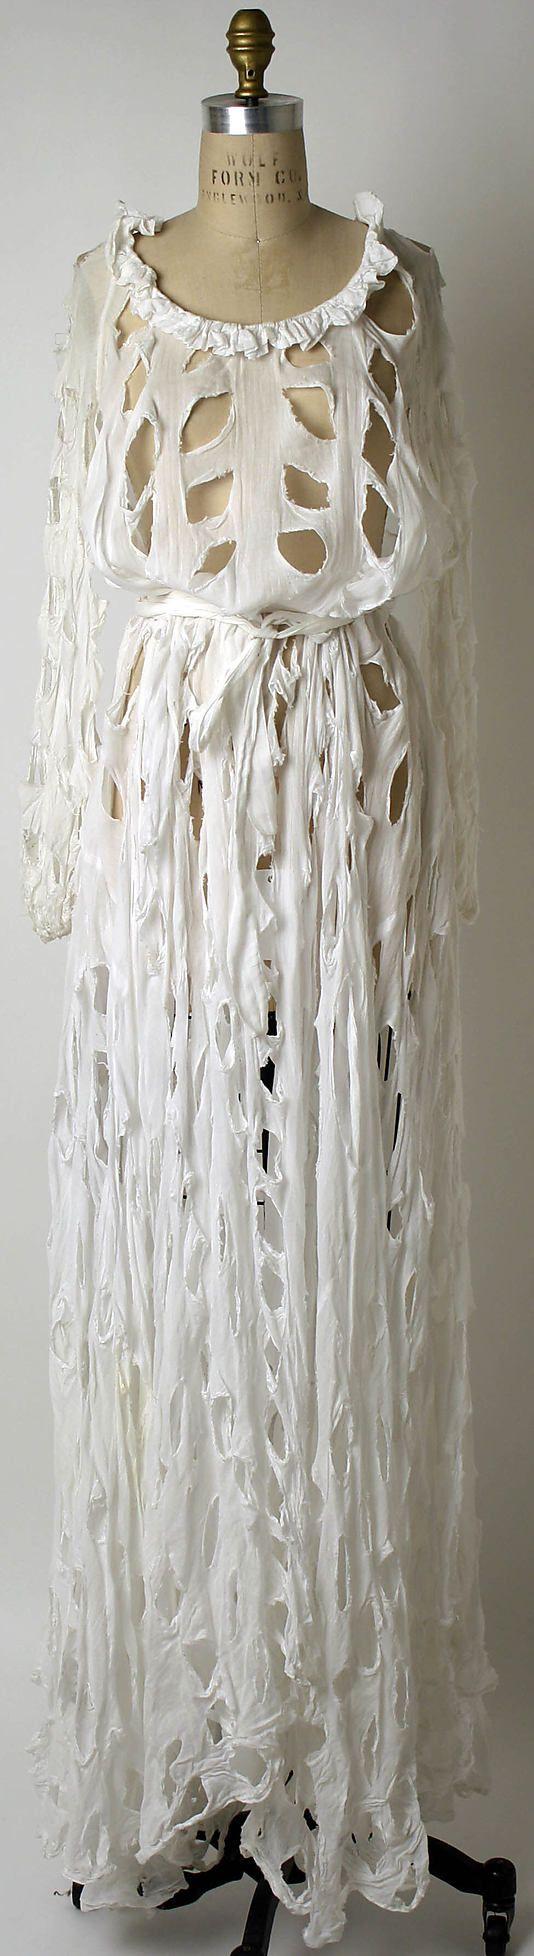 Vivienne Westwood (British, born 1941). Dress, spring/summer 1991. British. The Metropolitan Museum of Art, New York. Millia Davenport and Zipporah Fleisher Fund, 2006 (2006.15a–d) #punkfashion